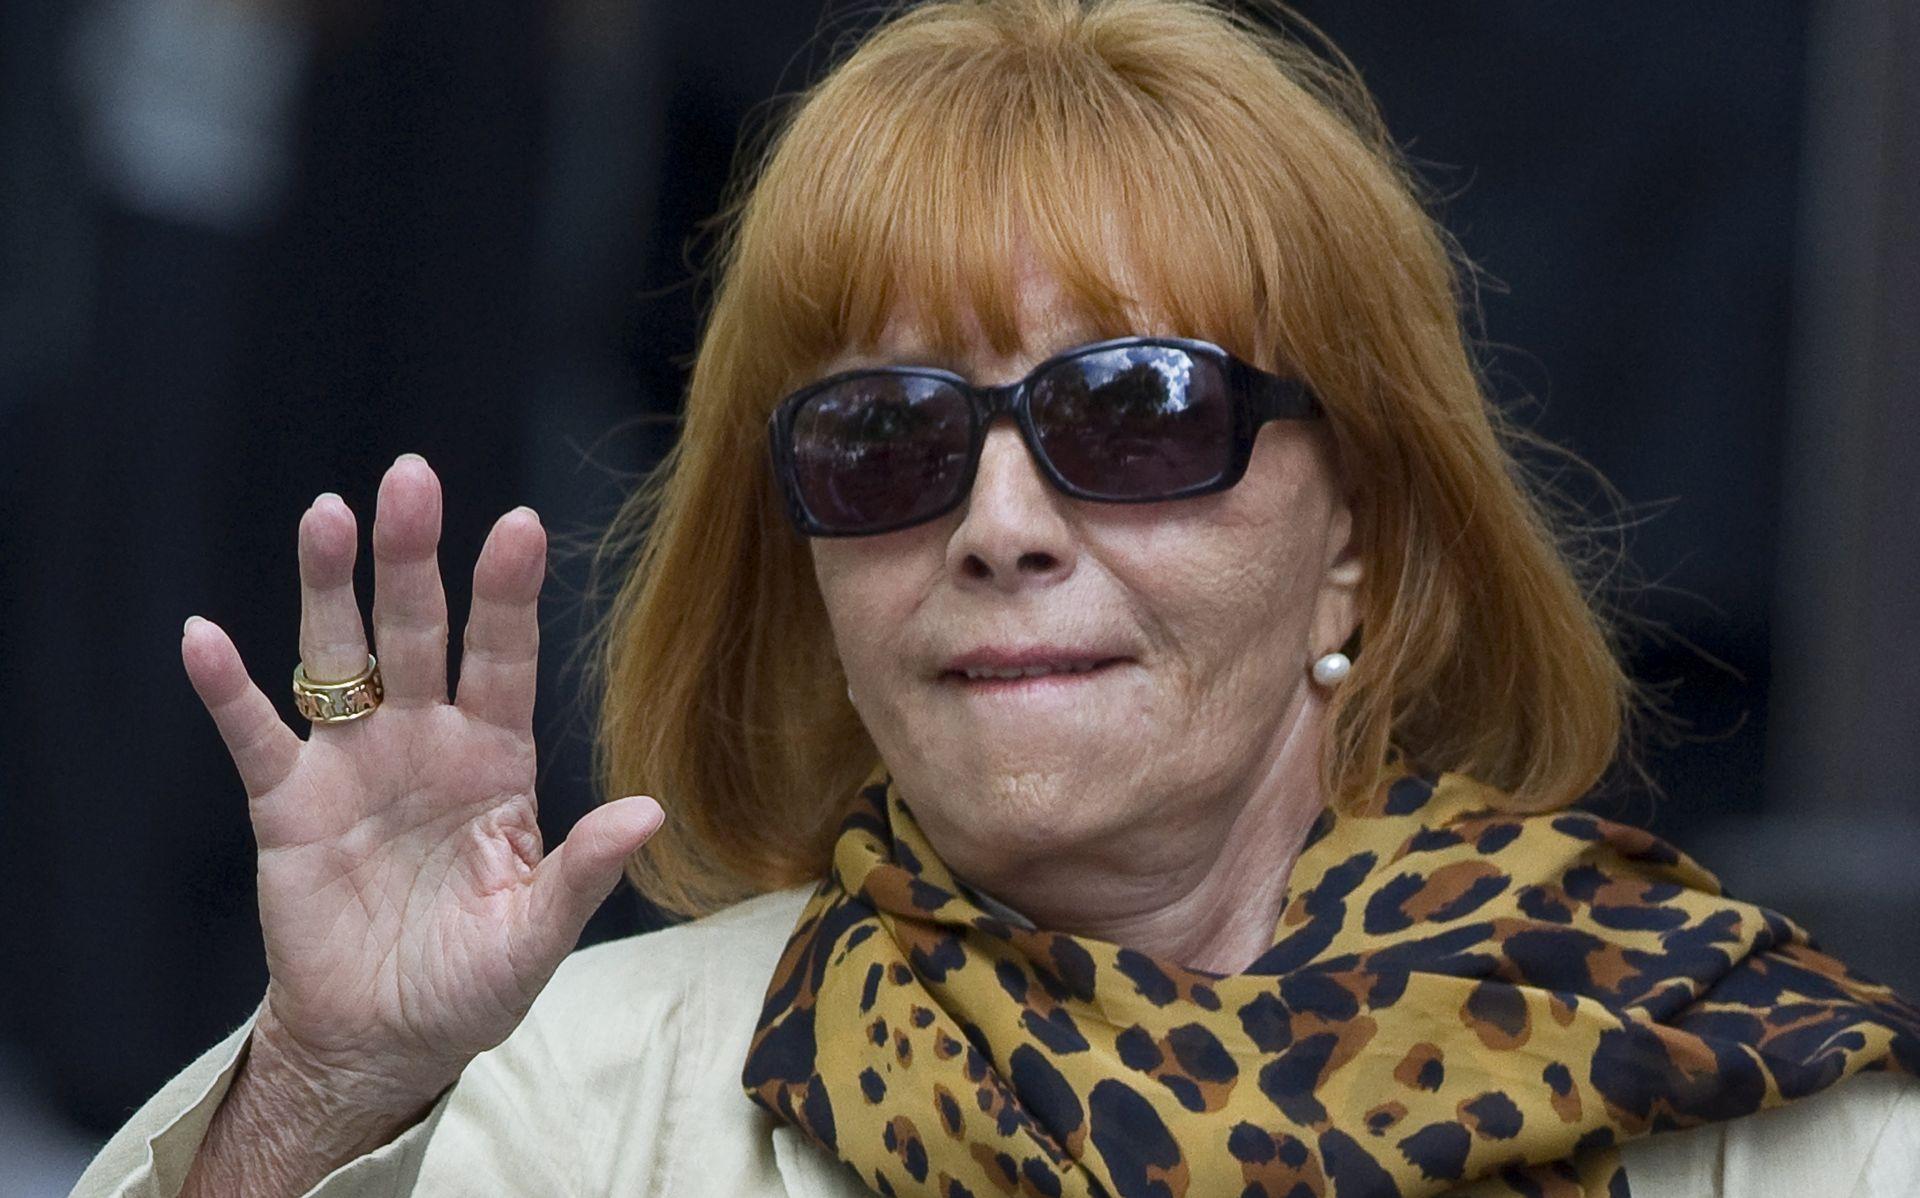 Umrla francuska glumica Stephane Audran